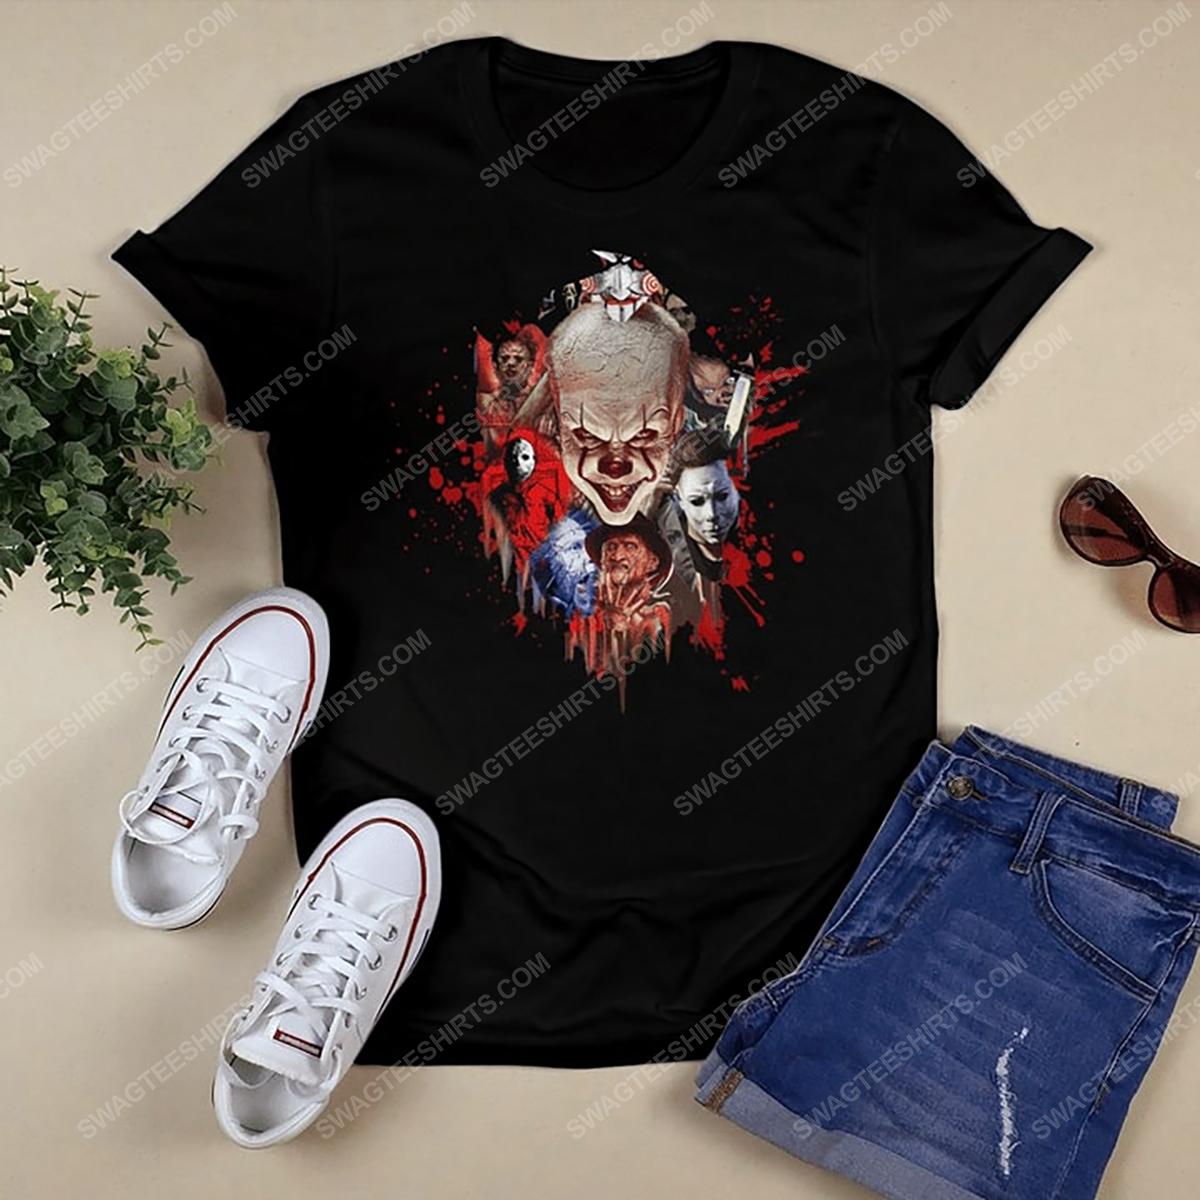 Halloween night horror movie villains with bloody tshirt 1